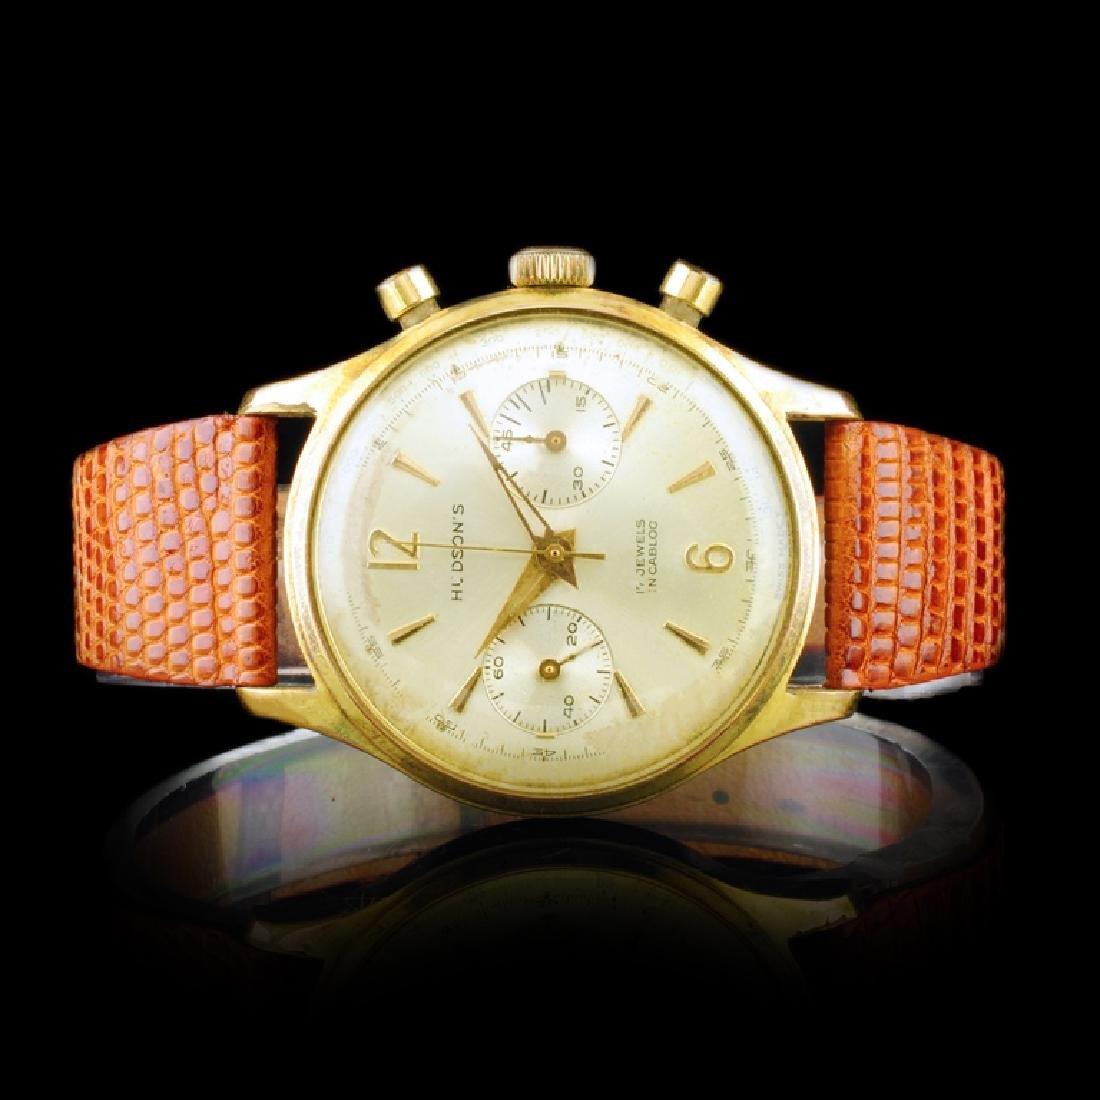 HUDSONS Swiss 17-Jewel 36mm Chronograph Watch